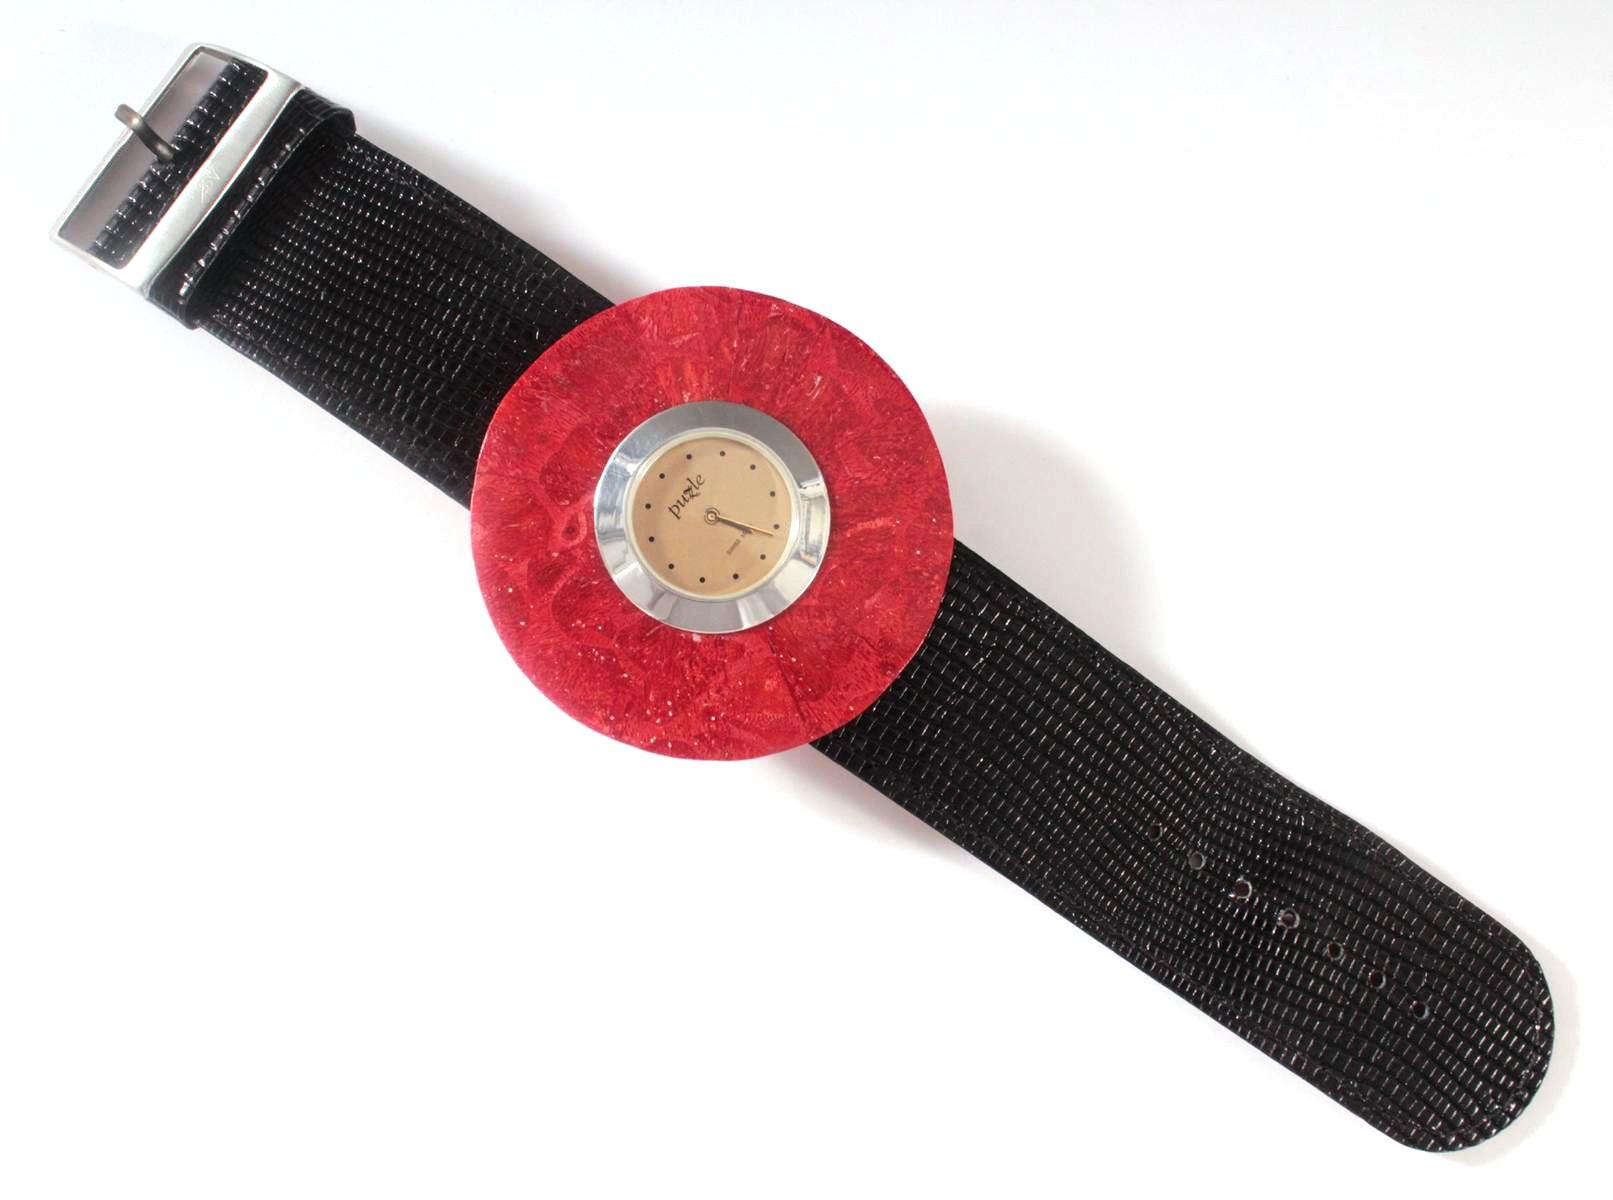 Damenarmbanduhr der Marke Puzle